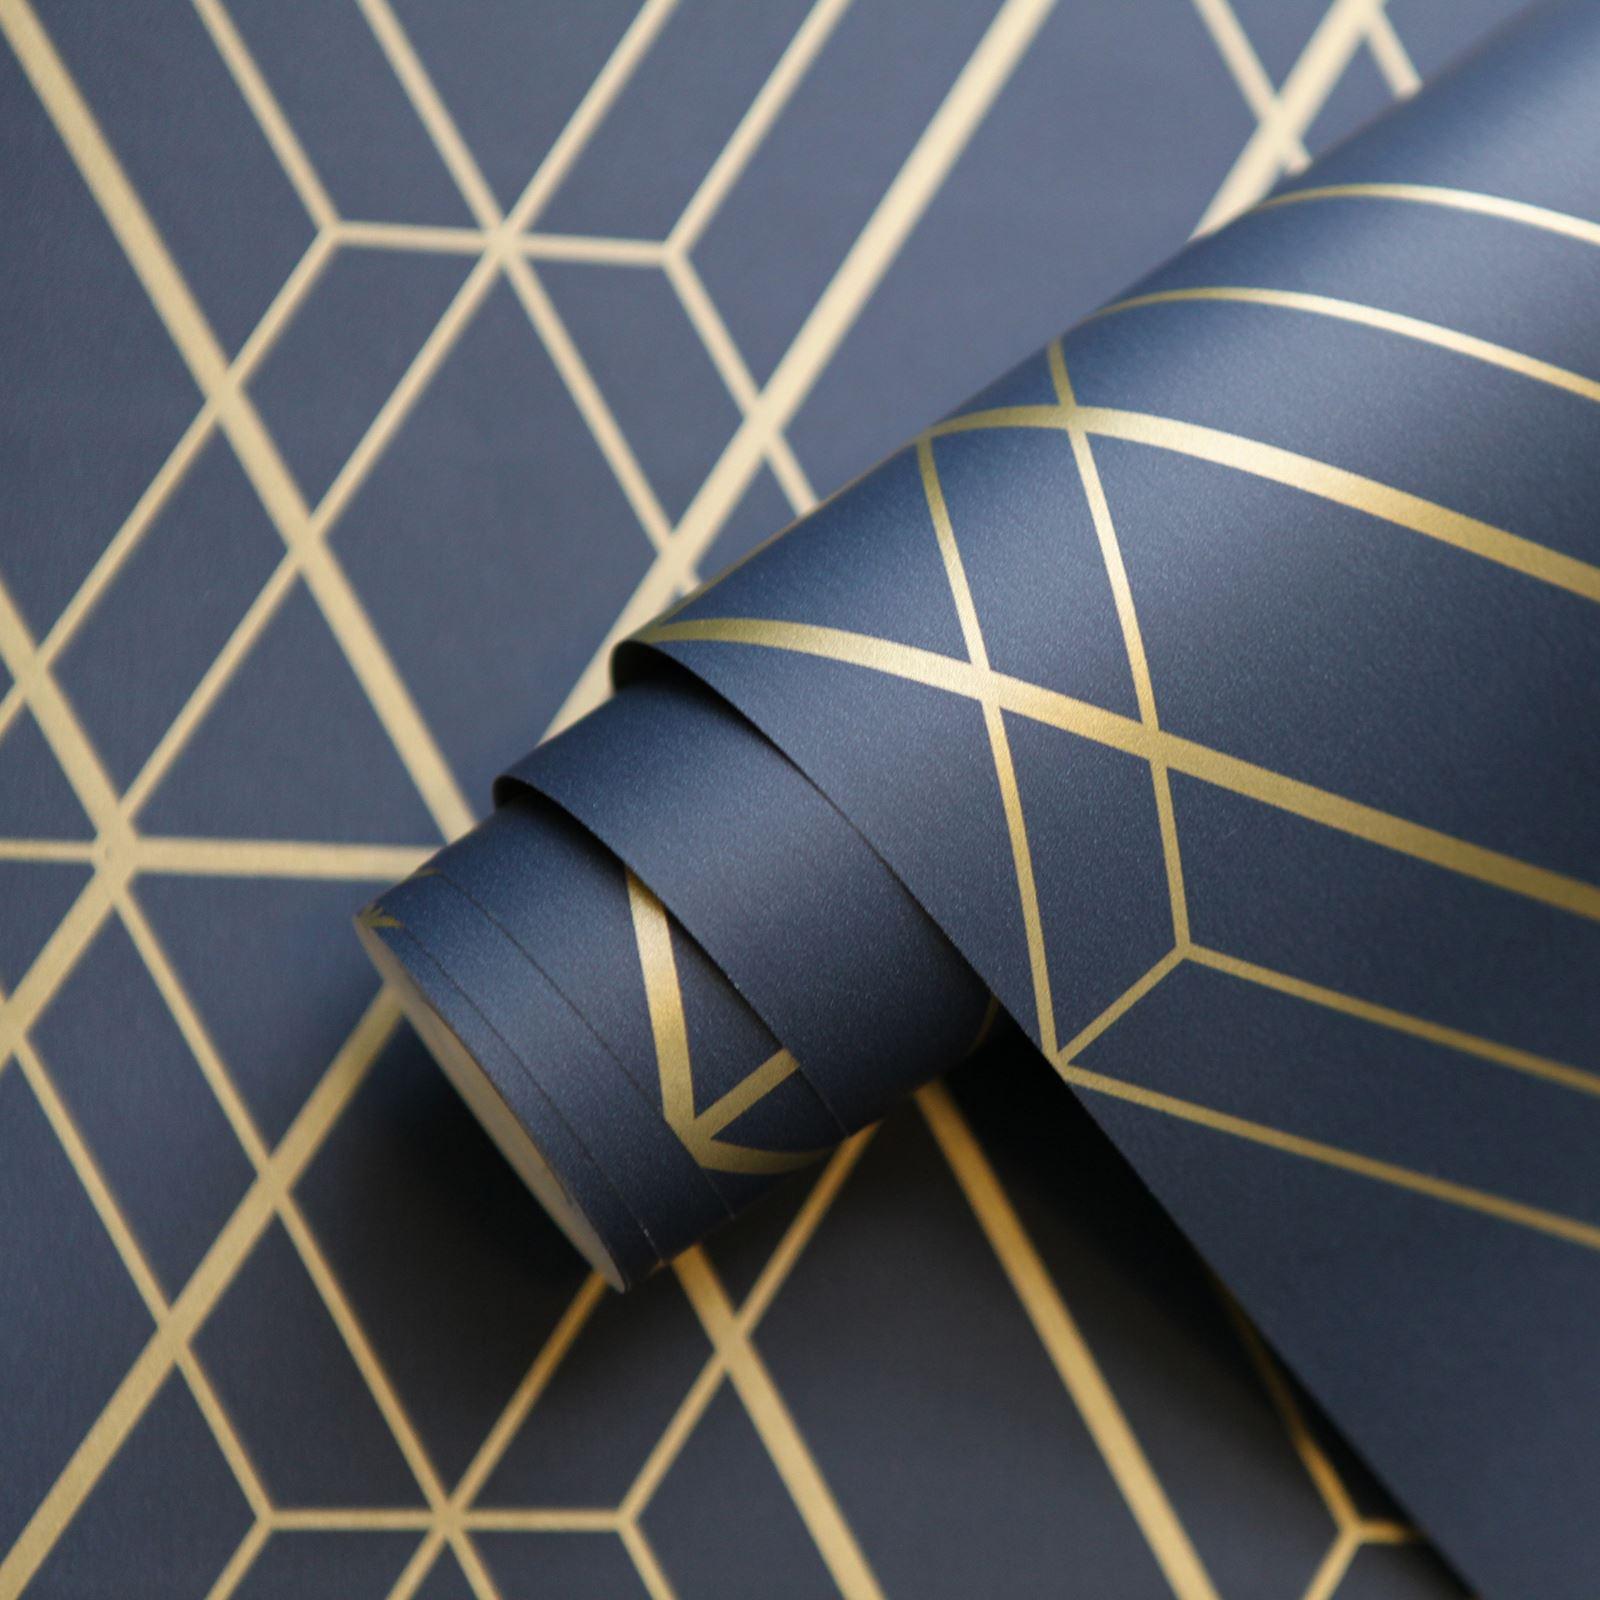 miniatura 36 - Carta da Parati Geometrica Arredamento Camera Moderno Vari Disegni e Colori